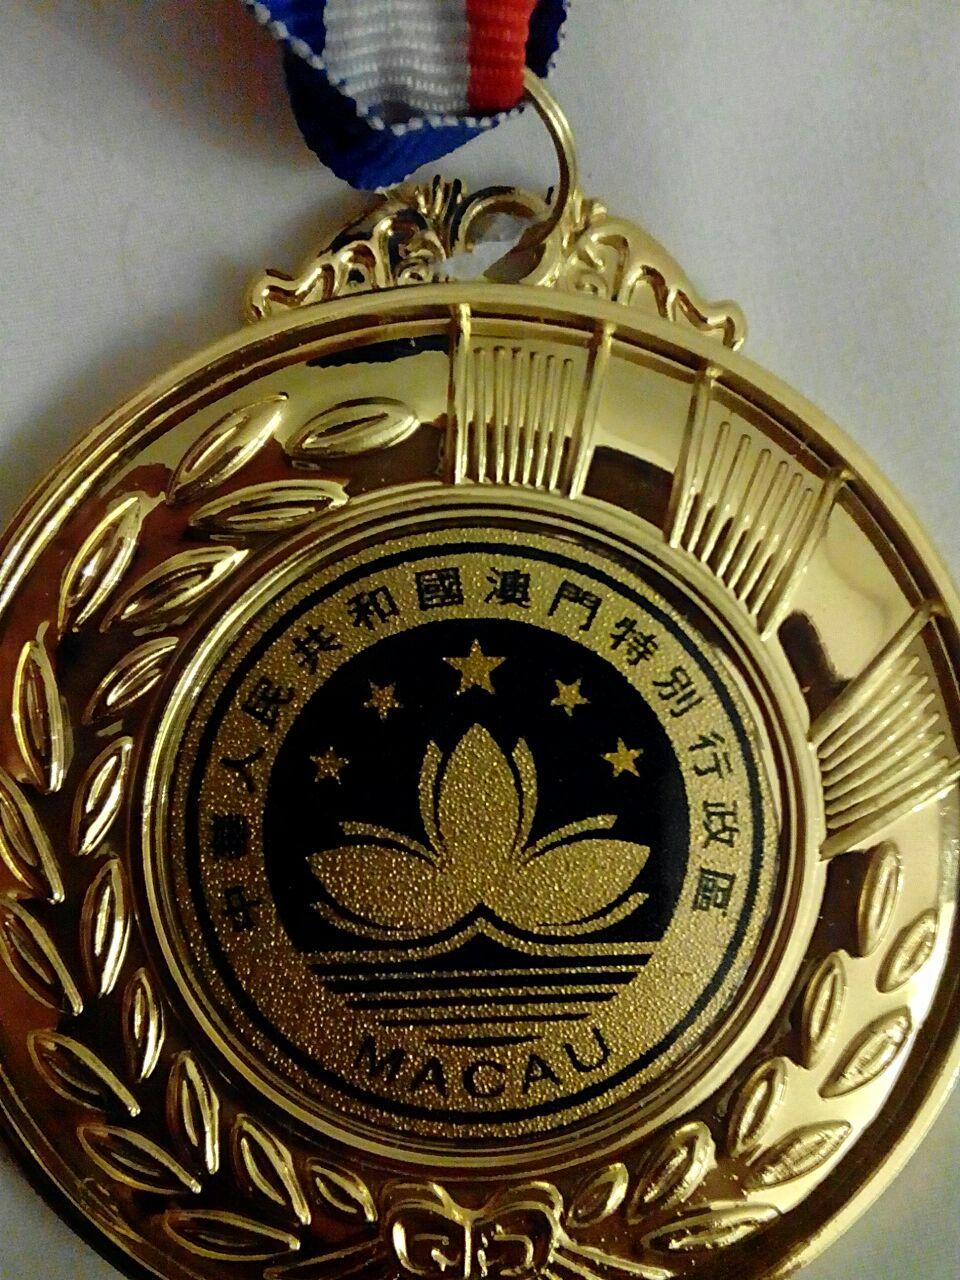 کسب مدال طلا مسابقات کاپ آزاد ماکائو توسط کاراته کار ایذهای